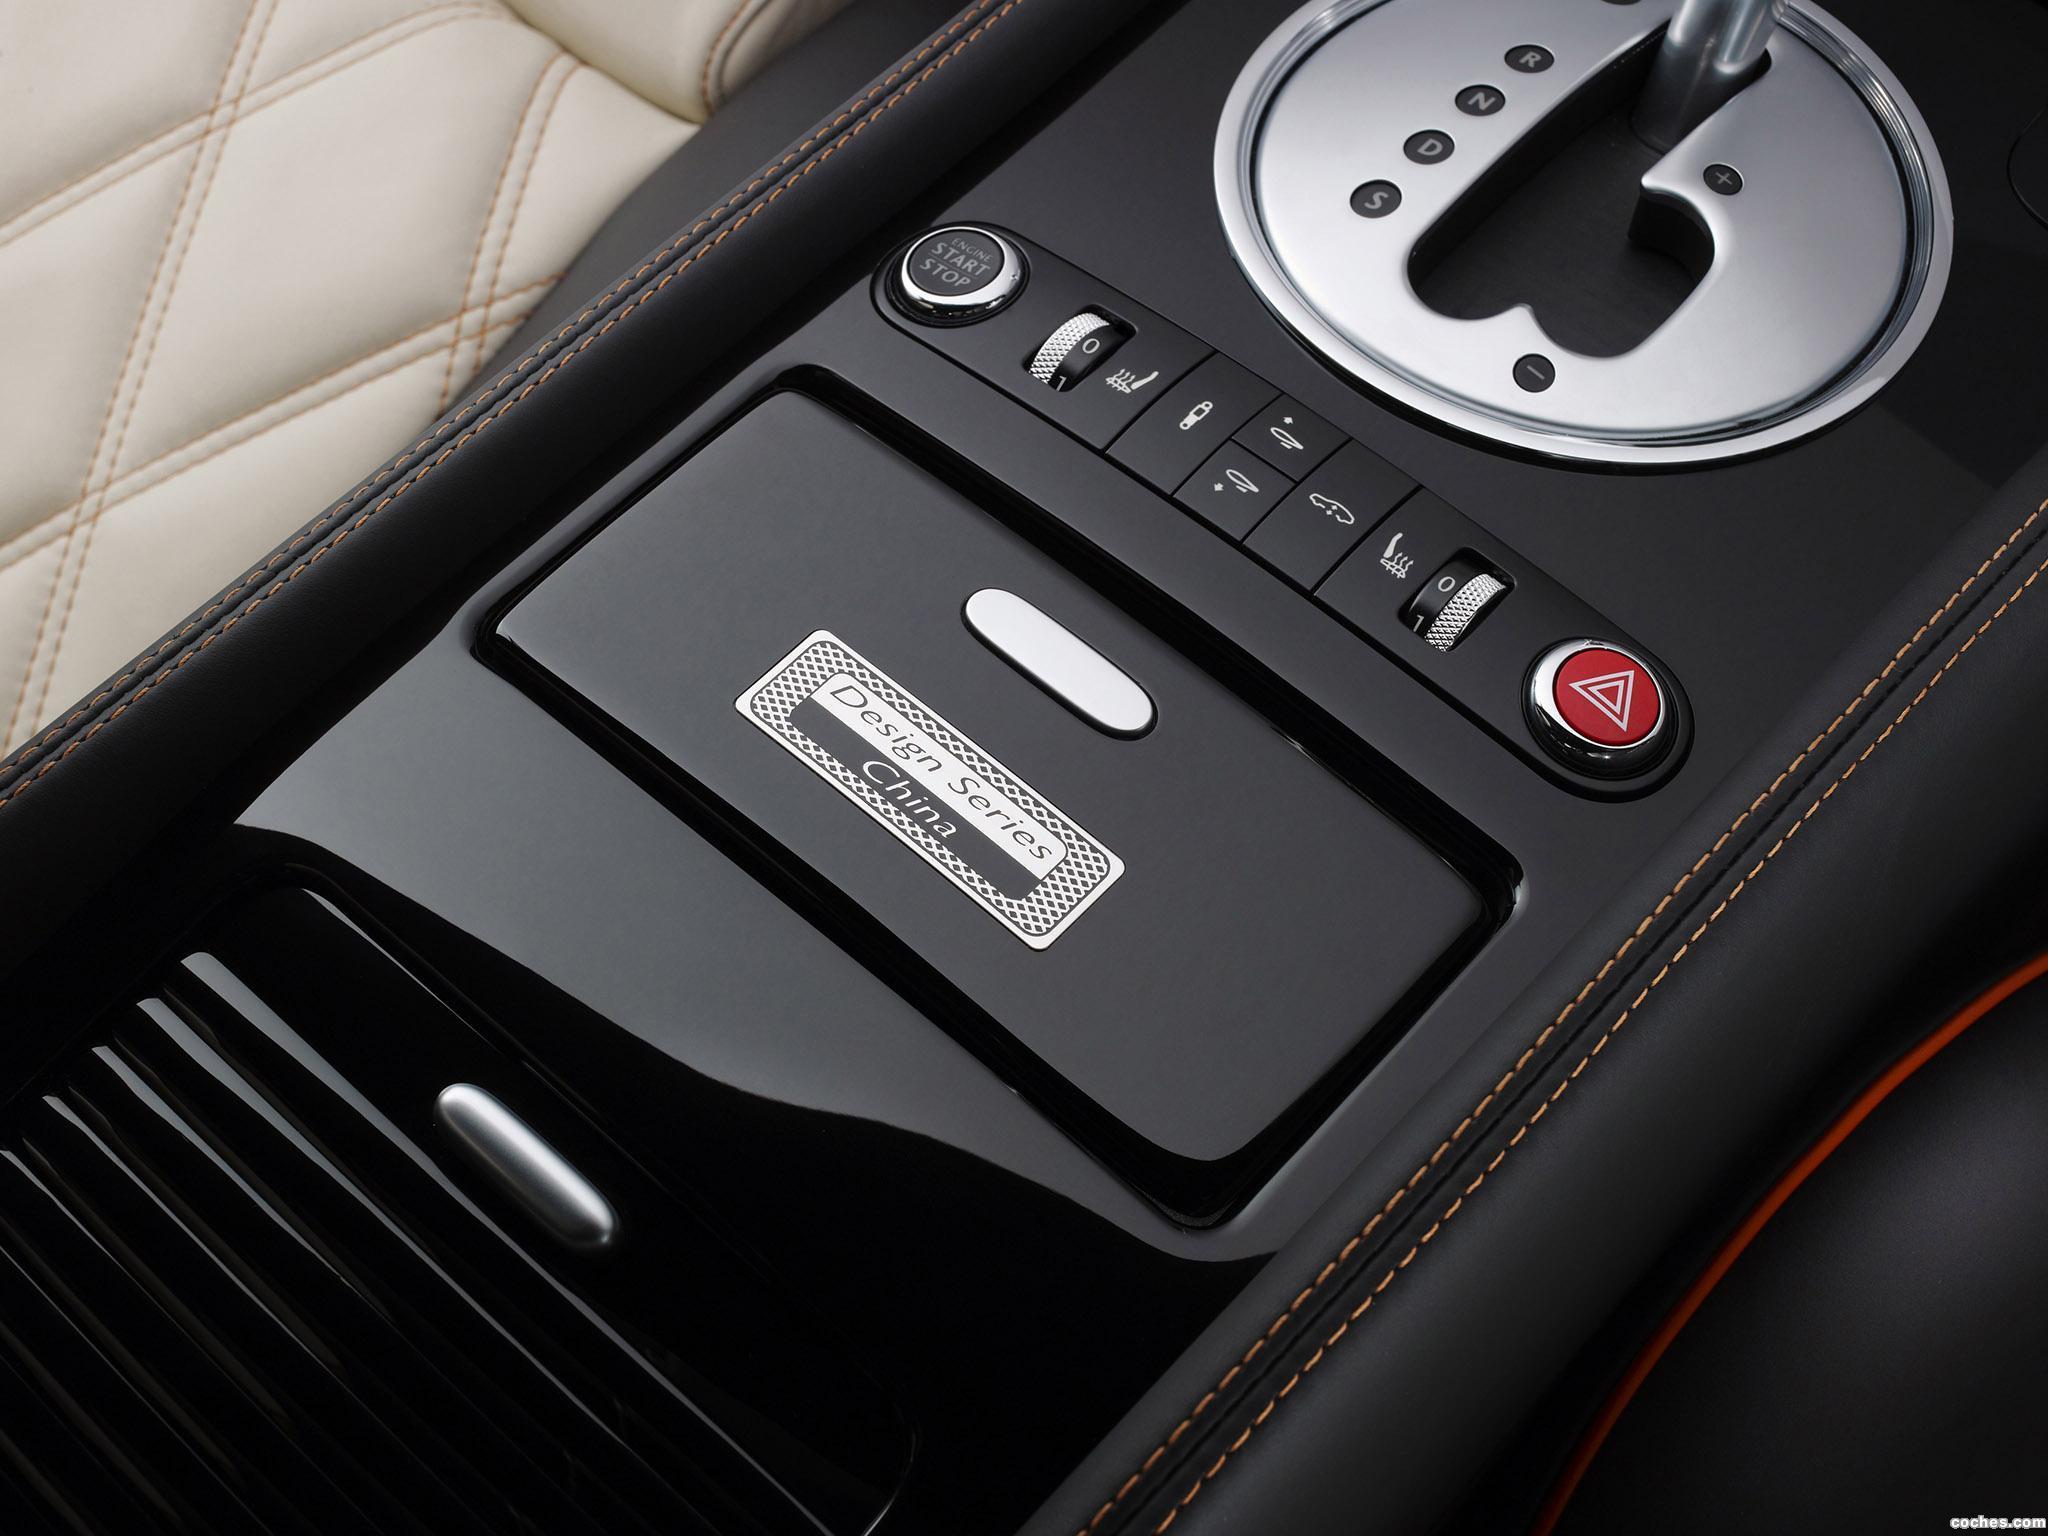 Foto 2 de Bentley esign Series China 2010